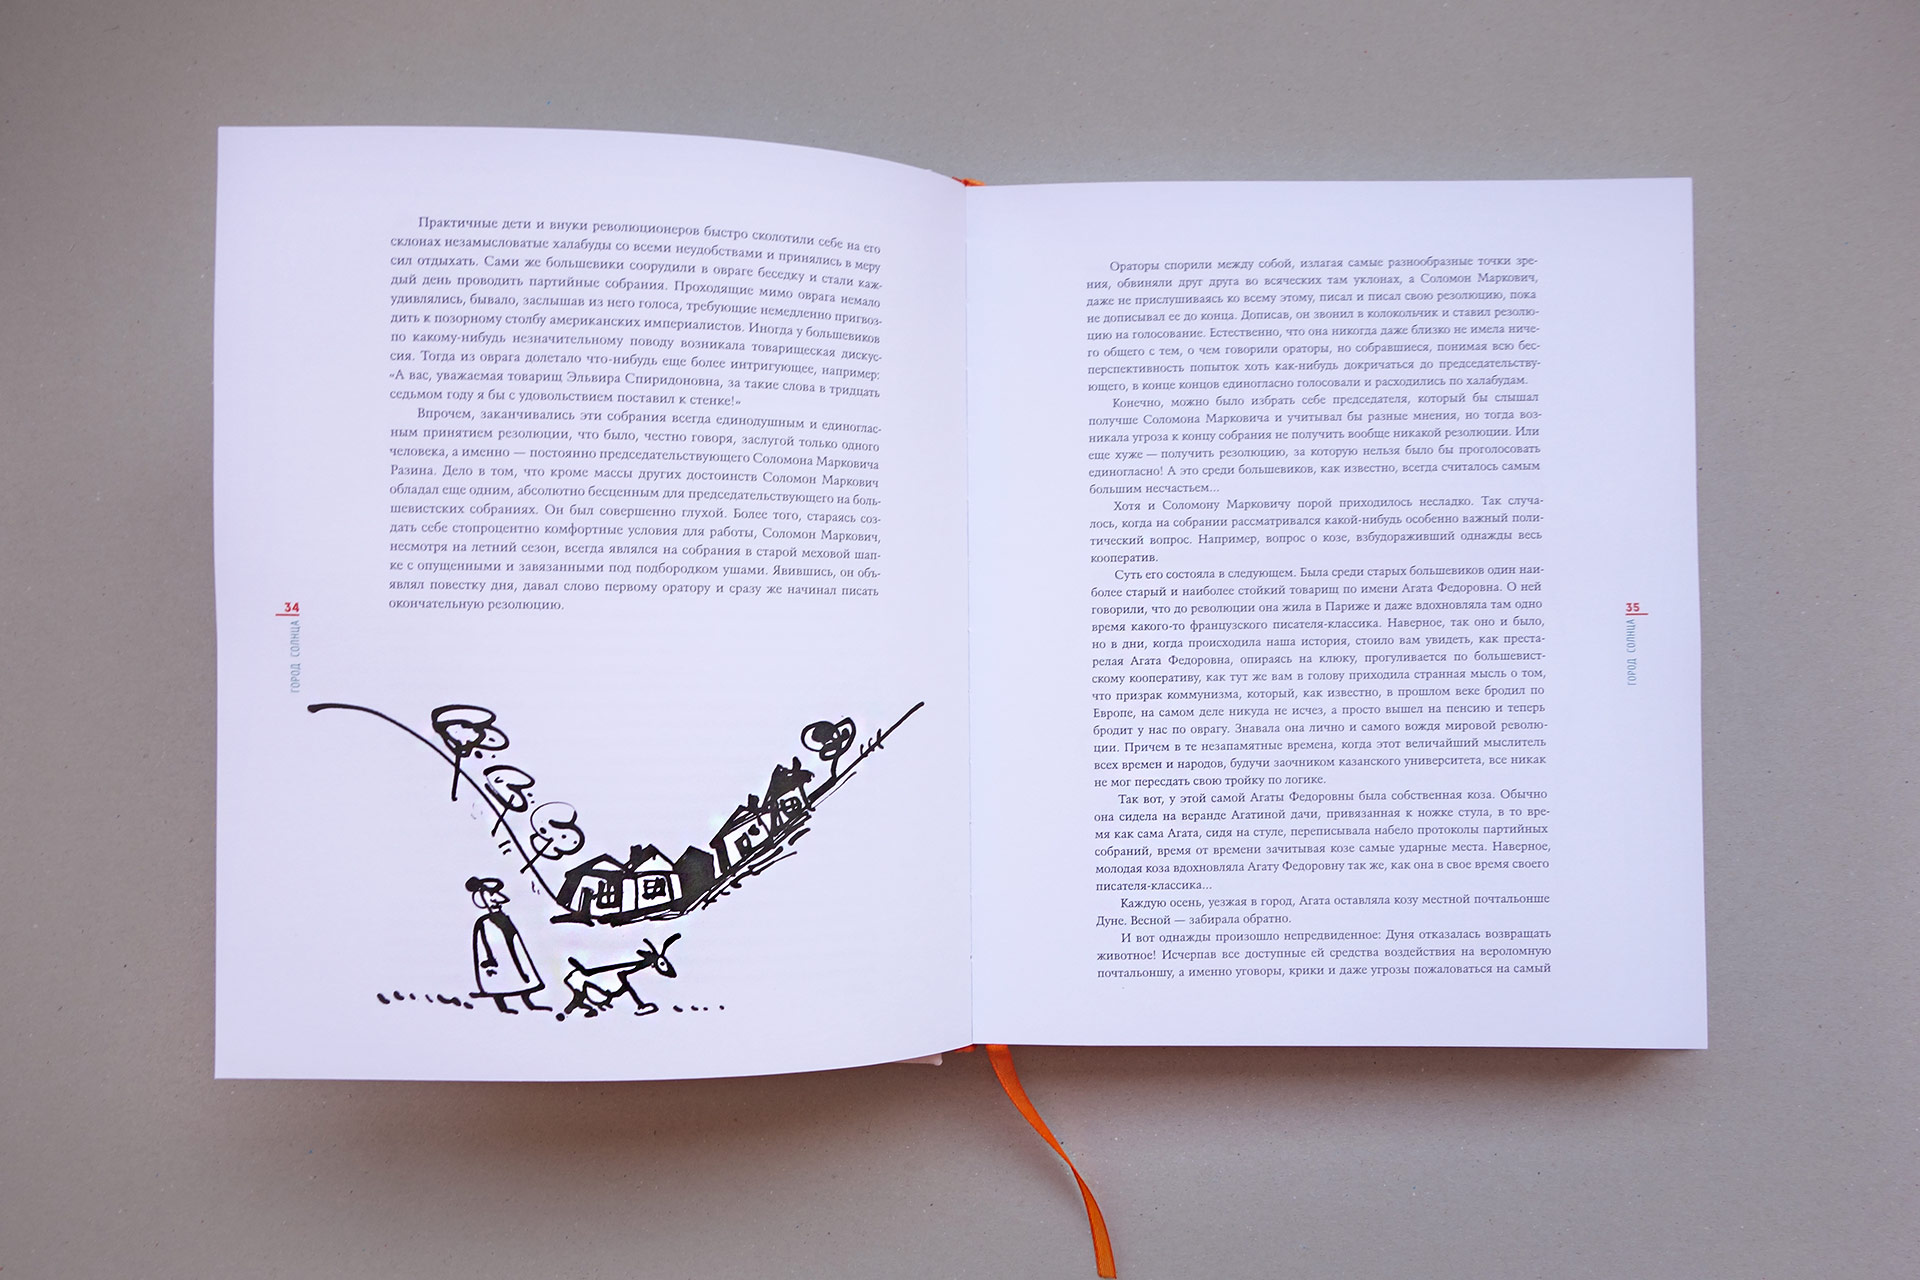 Asgard Branding, anniversary album, print, printed publications, book design, George Golubenko, Michael Reva, illustrations